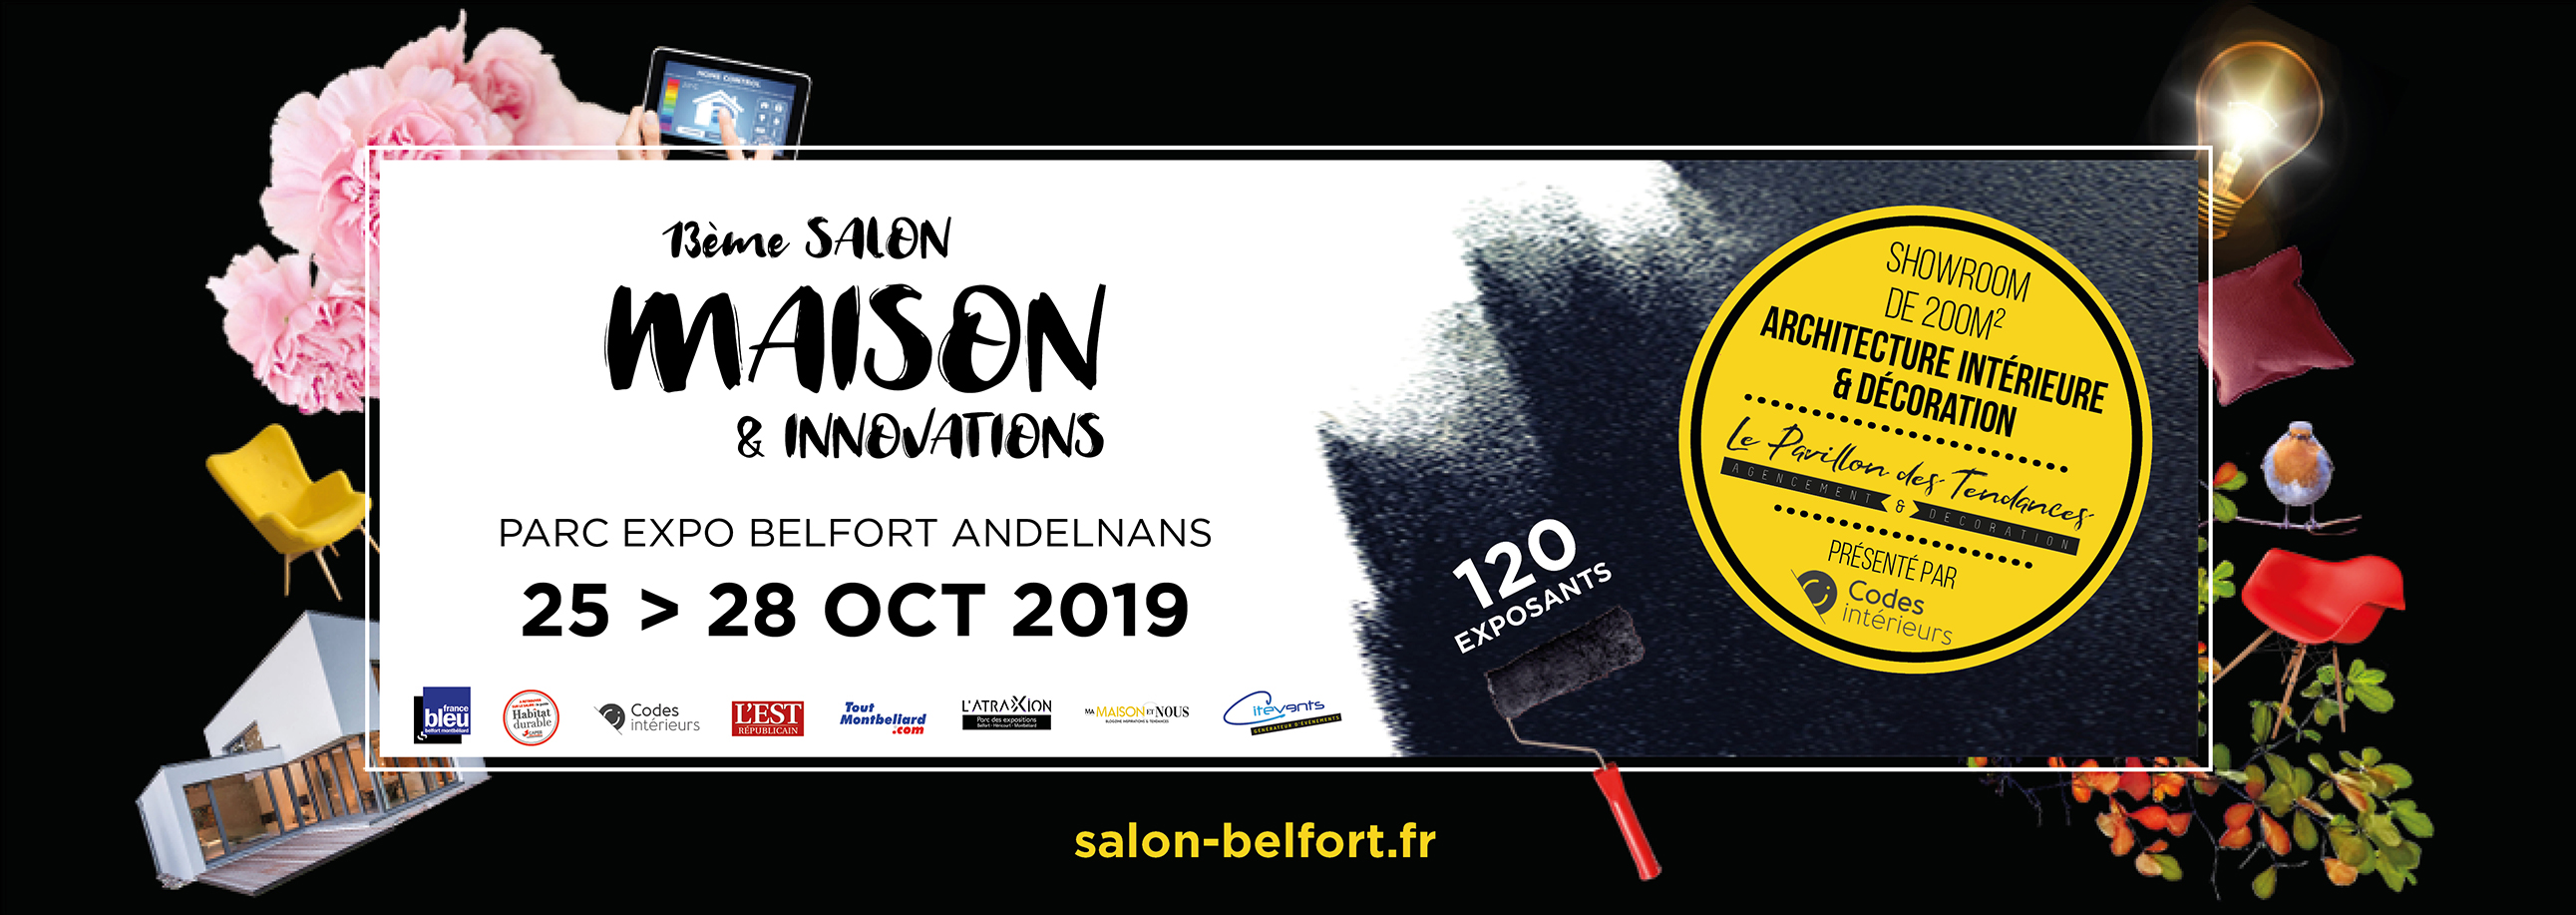 slider-maisons-innovations-belfort-2019